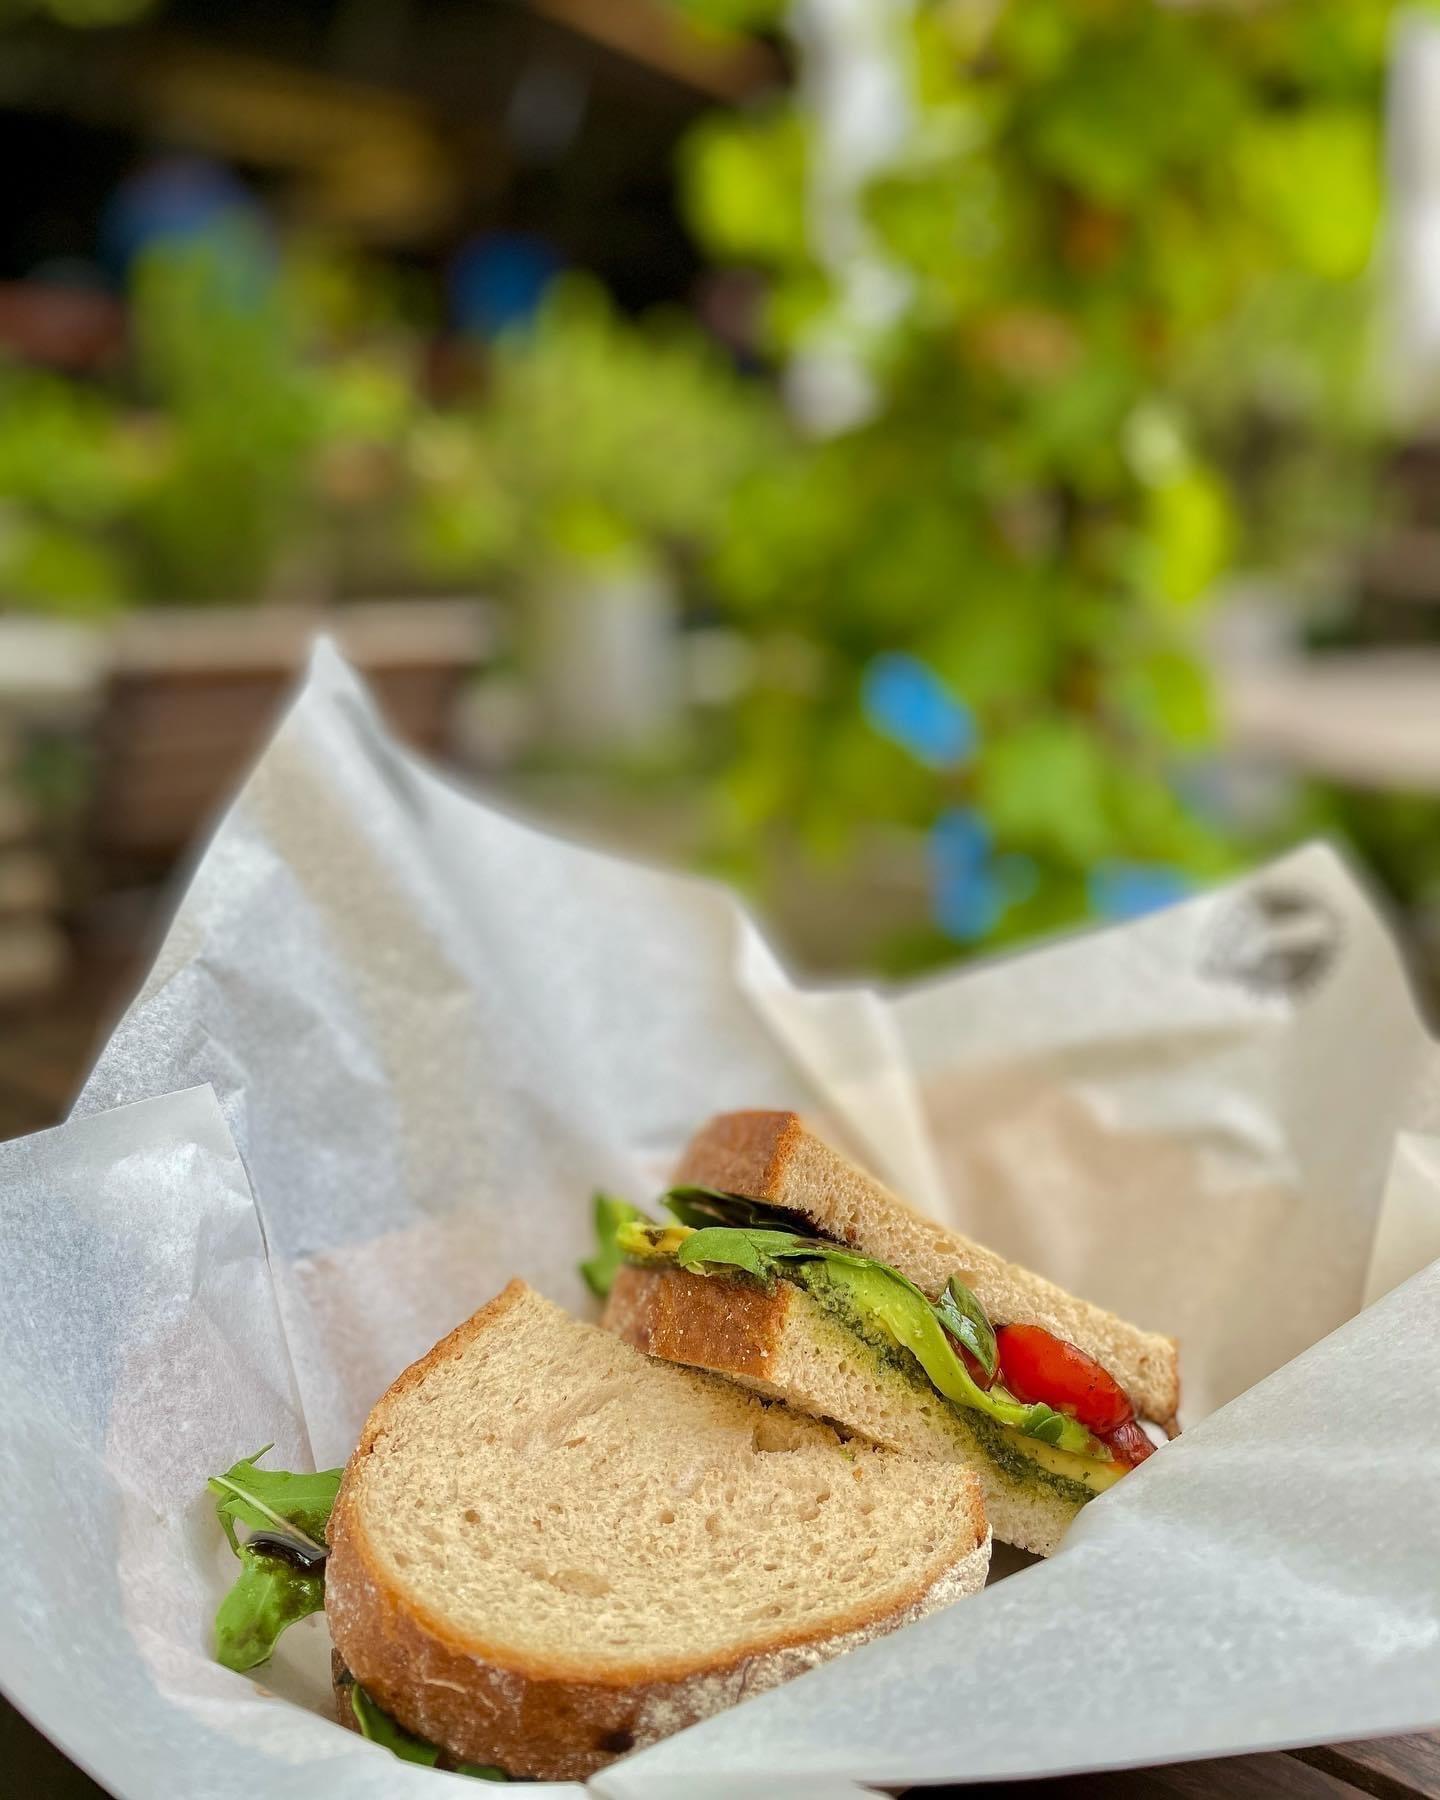 The Sandwich Revolution